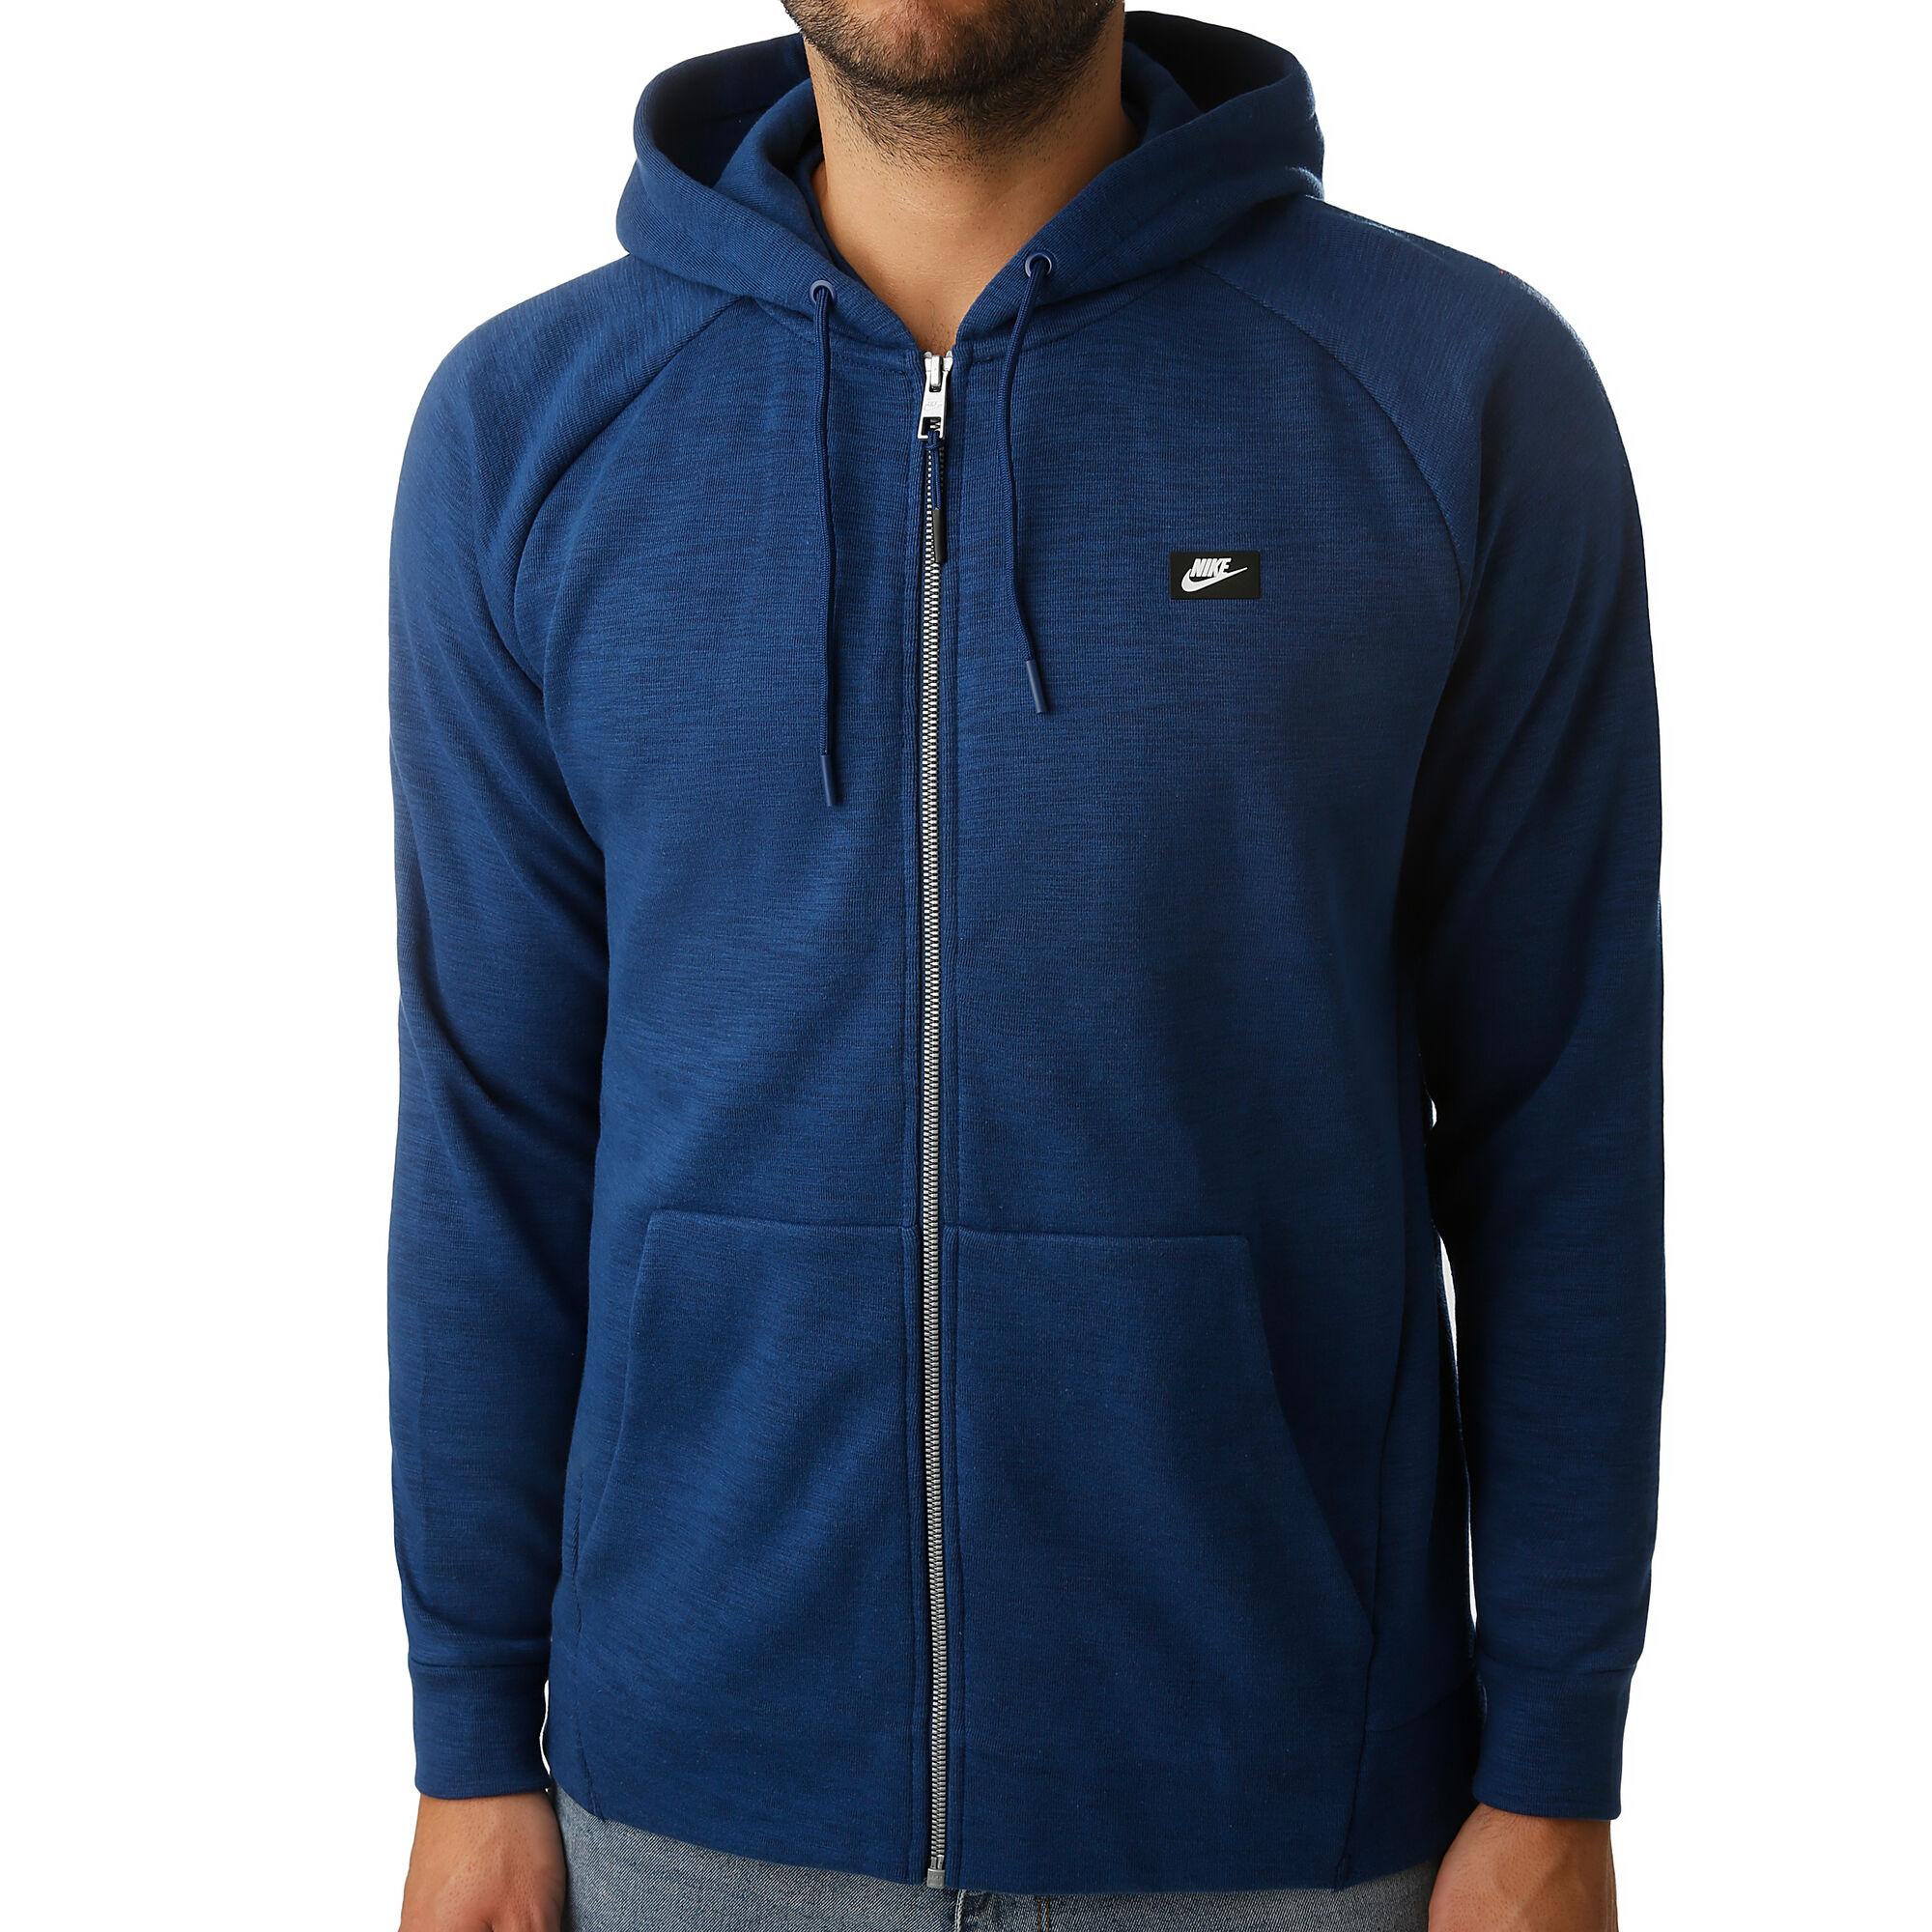 Presentar Inconveniencia Relativamente  buy Nike Sportswear Optic Zip Hoodie Men - Dark Blue, Blue online |  Jogging-Point